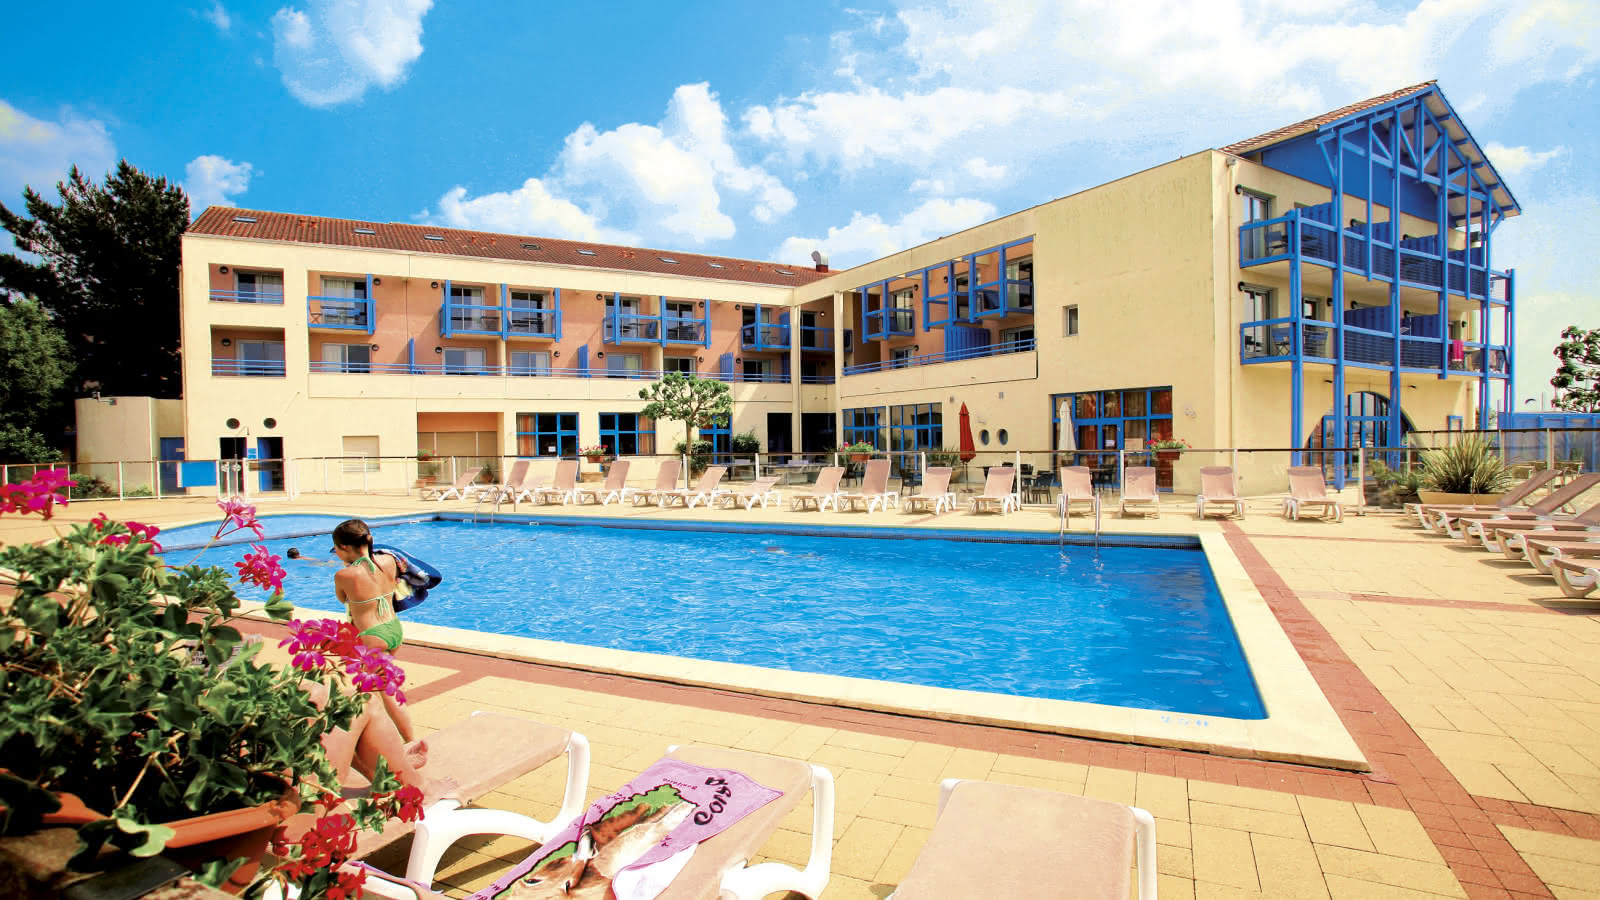 Résidence de tourisme Odalys Résidence du Port Hourtin Piscine